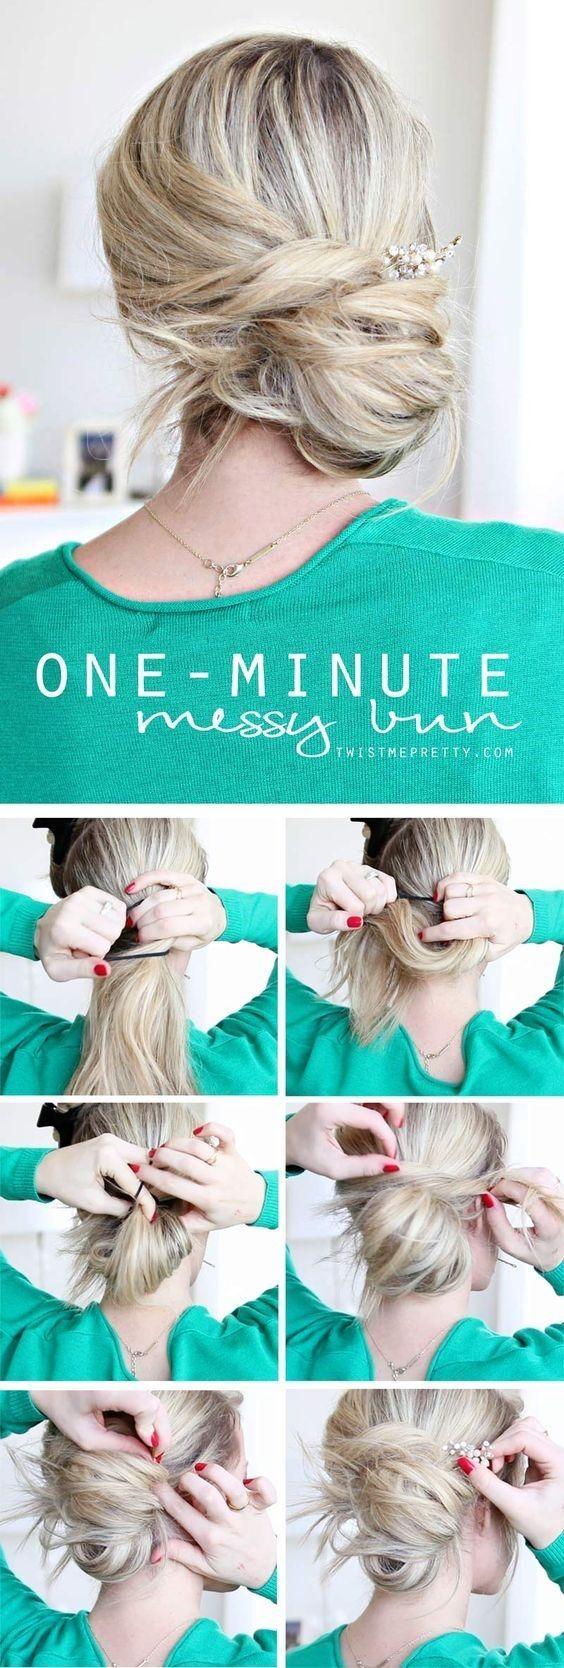 9 trucos para el cabello que toda mujer debe saber | StylishCircle Germany